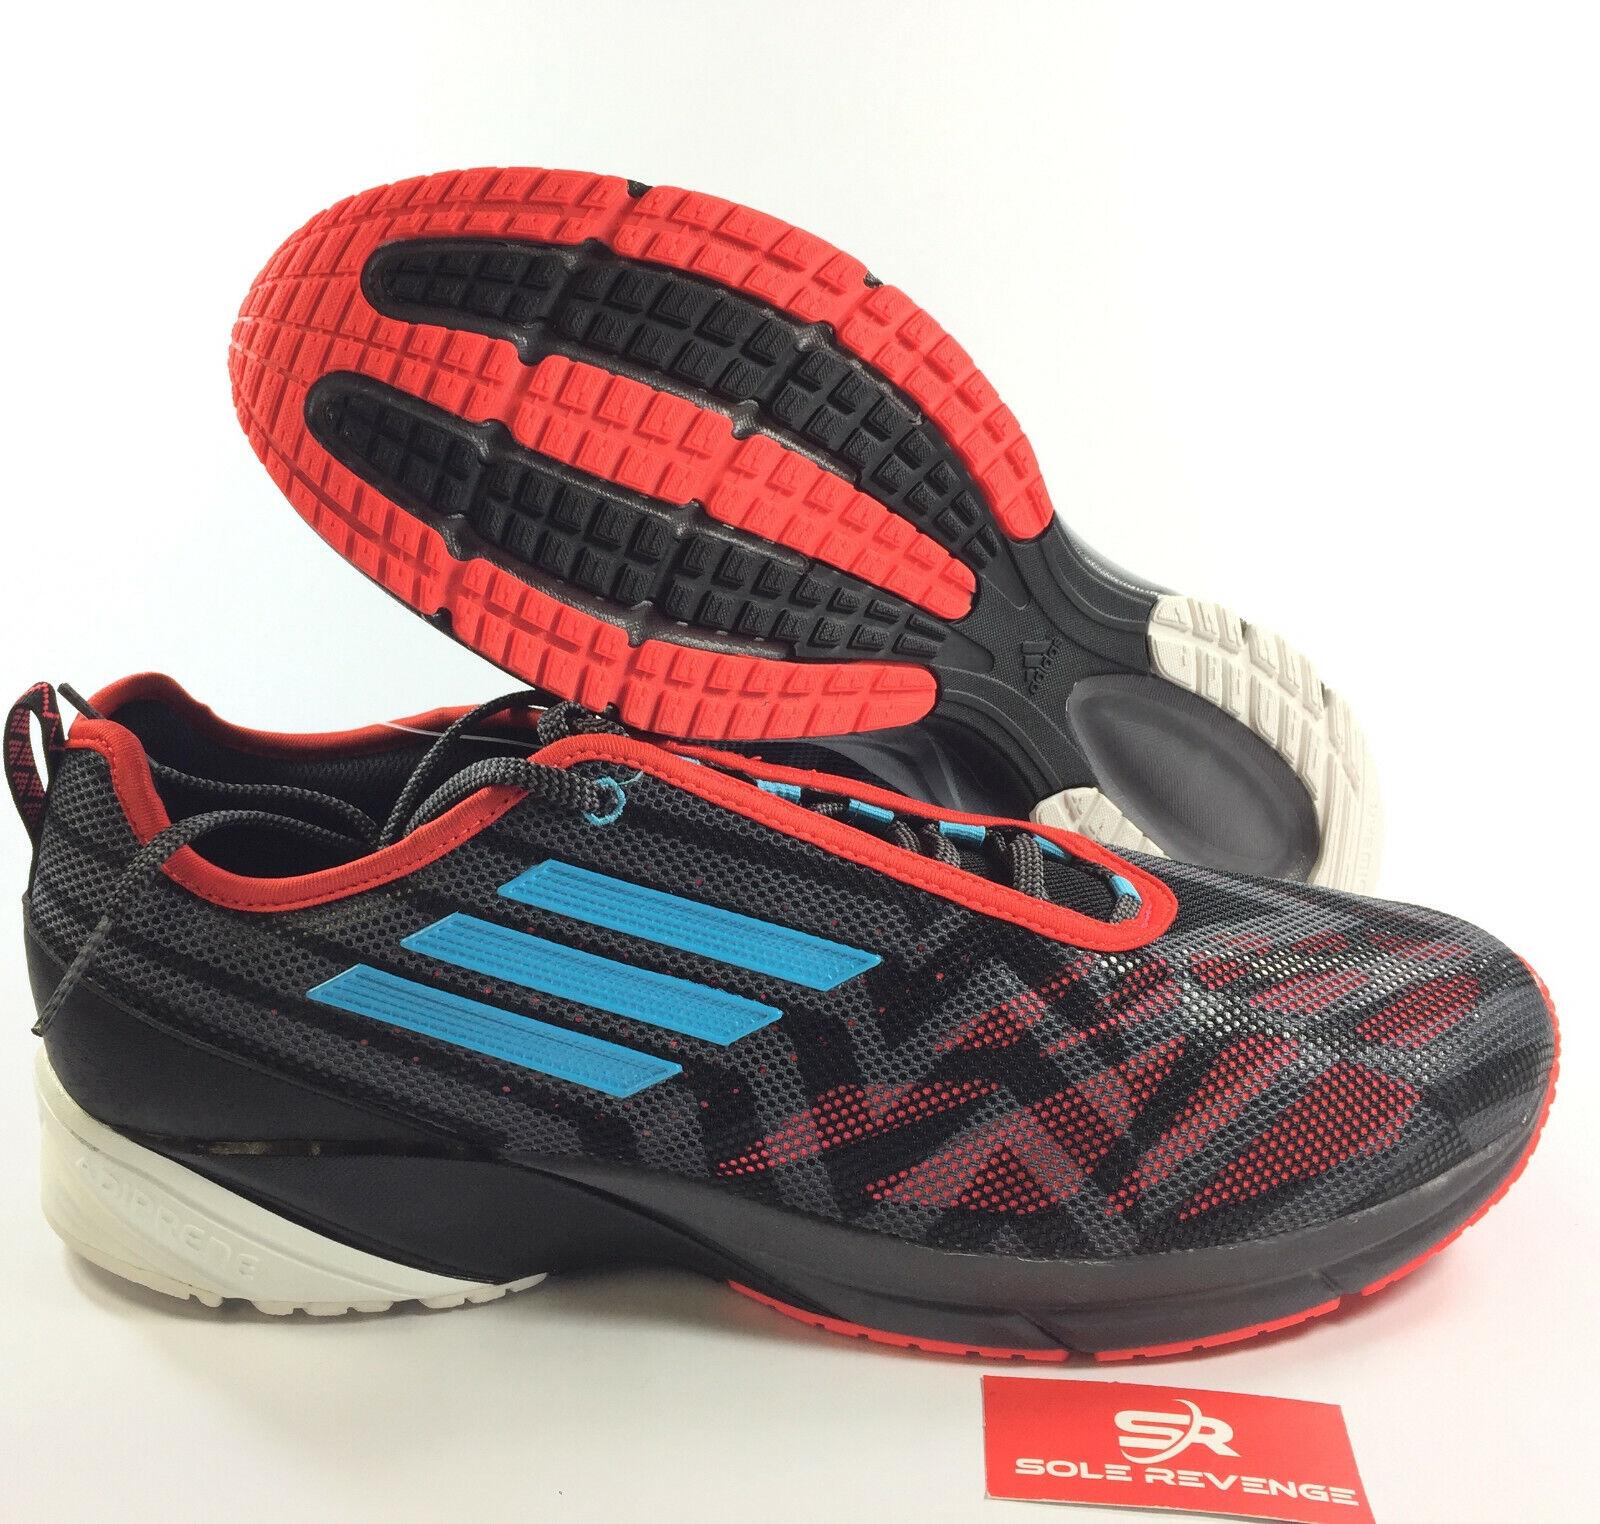 New 13 adidas IMPACT RUNNER White bluee Red Black Running shoes G67363